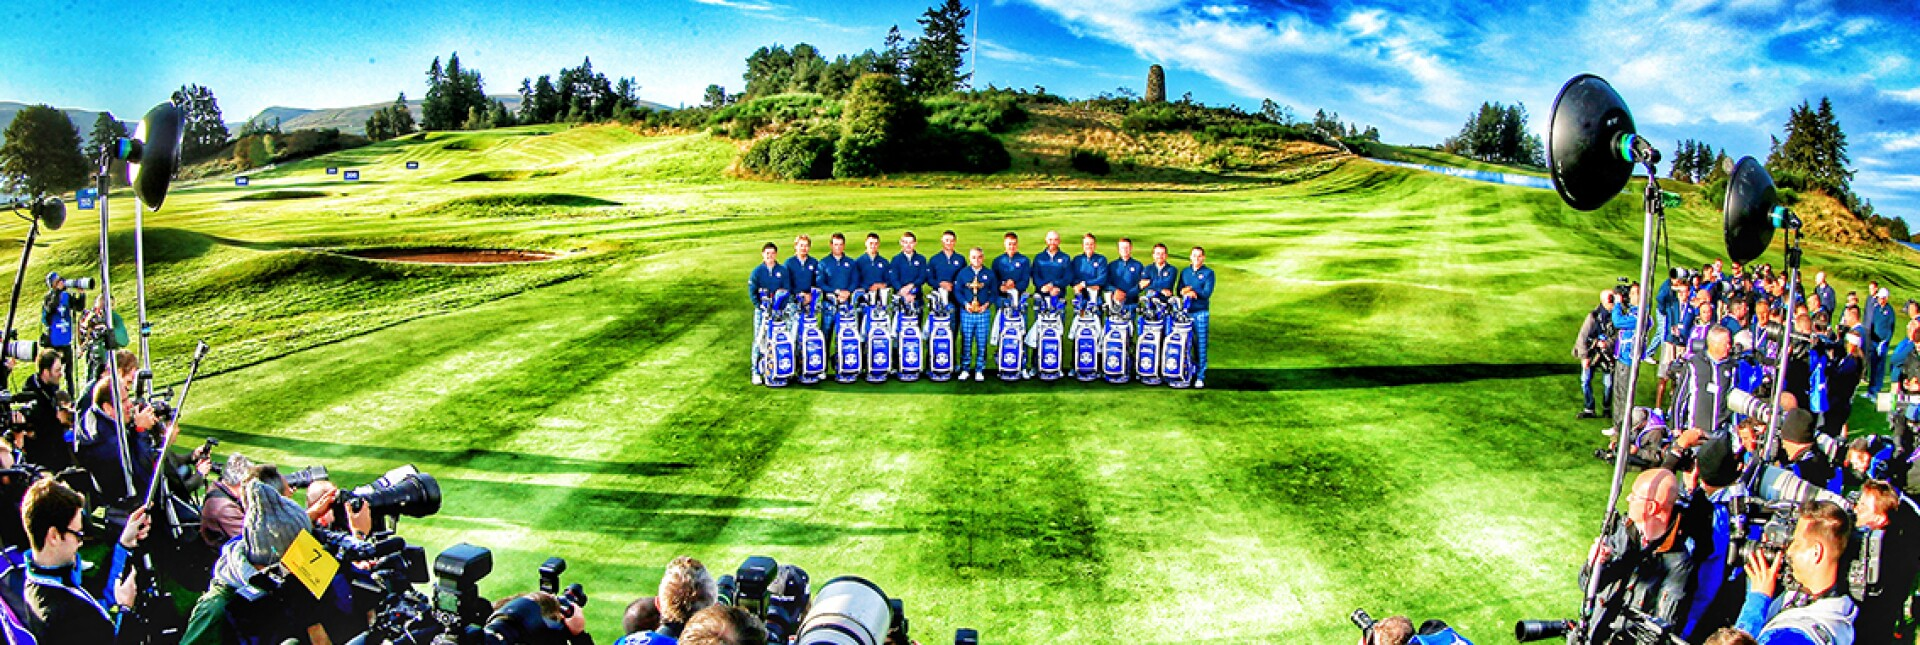 Gleneagles team1.jpg